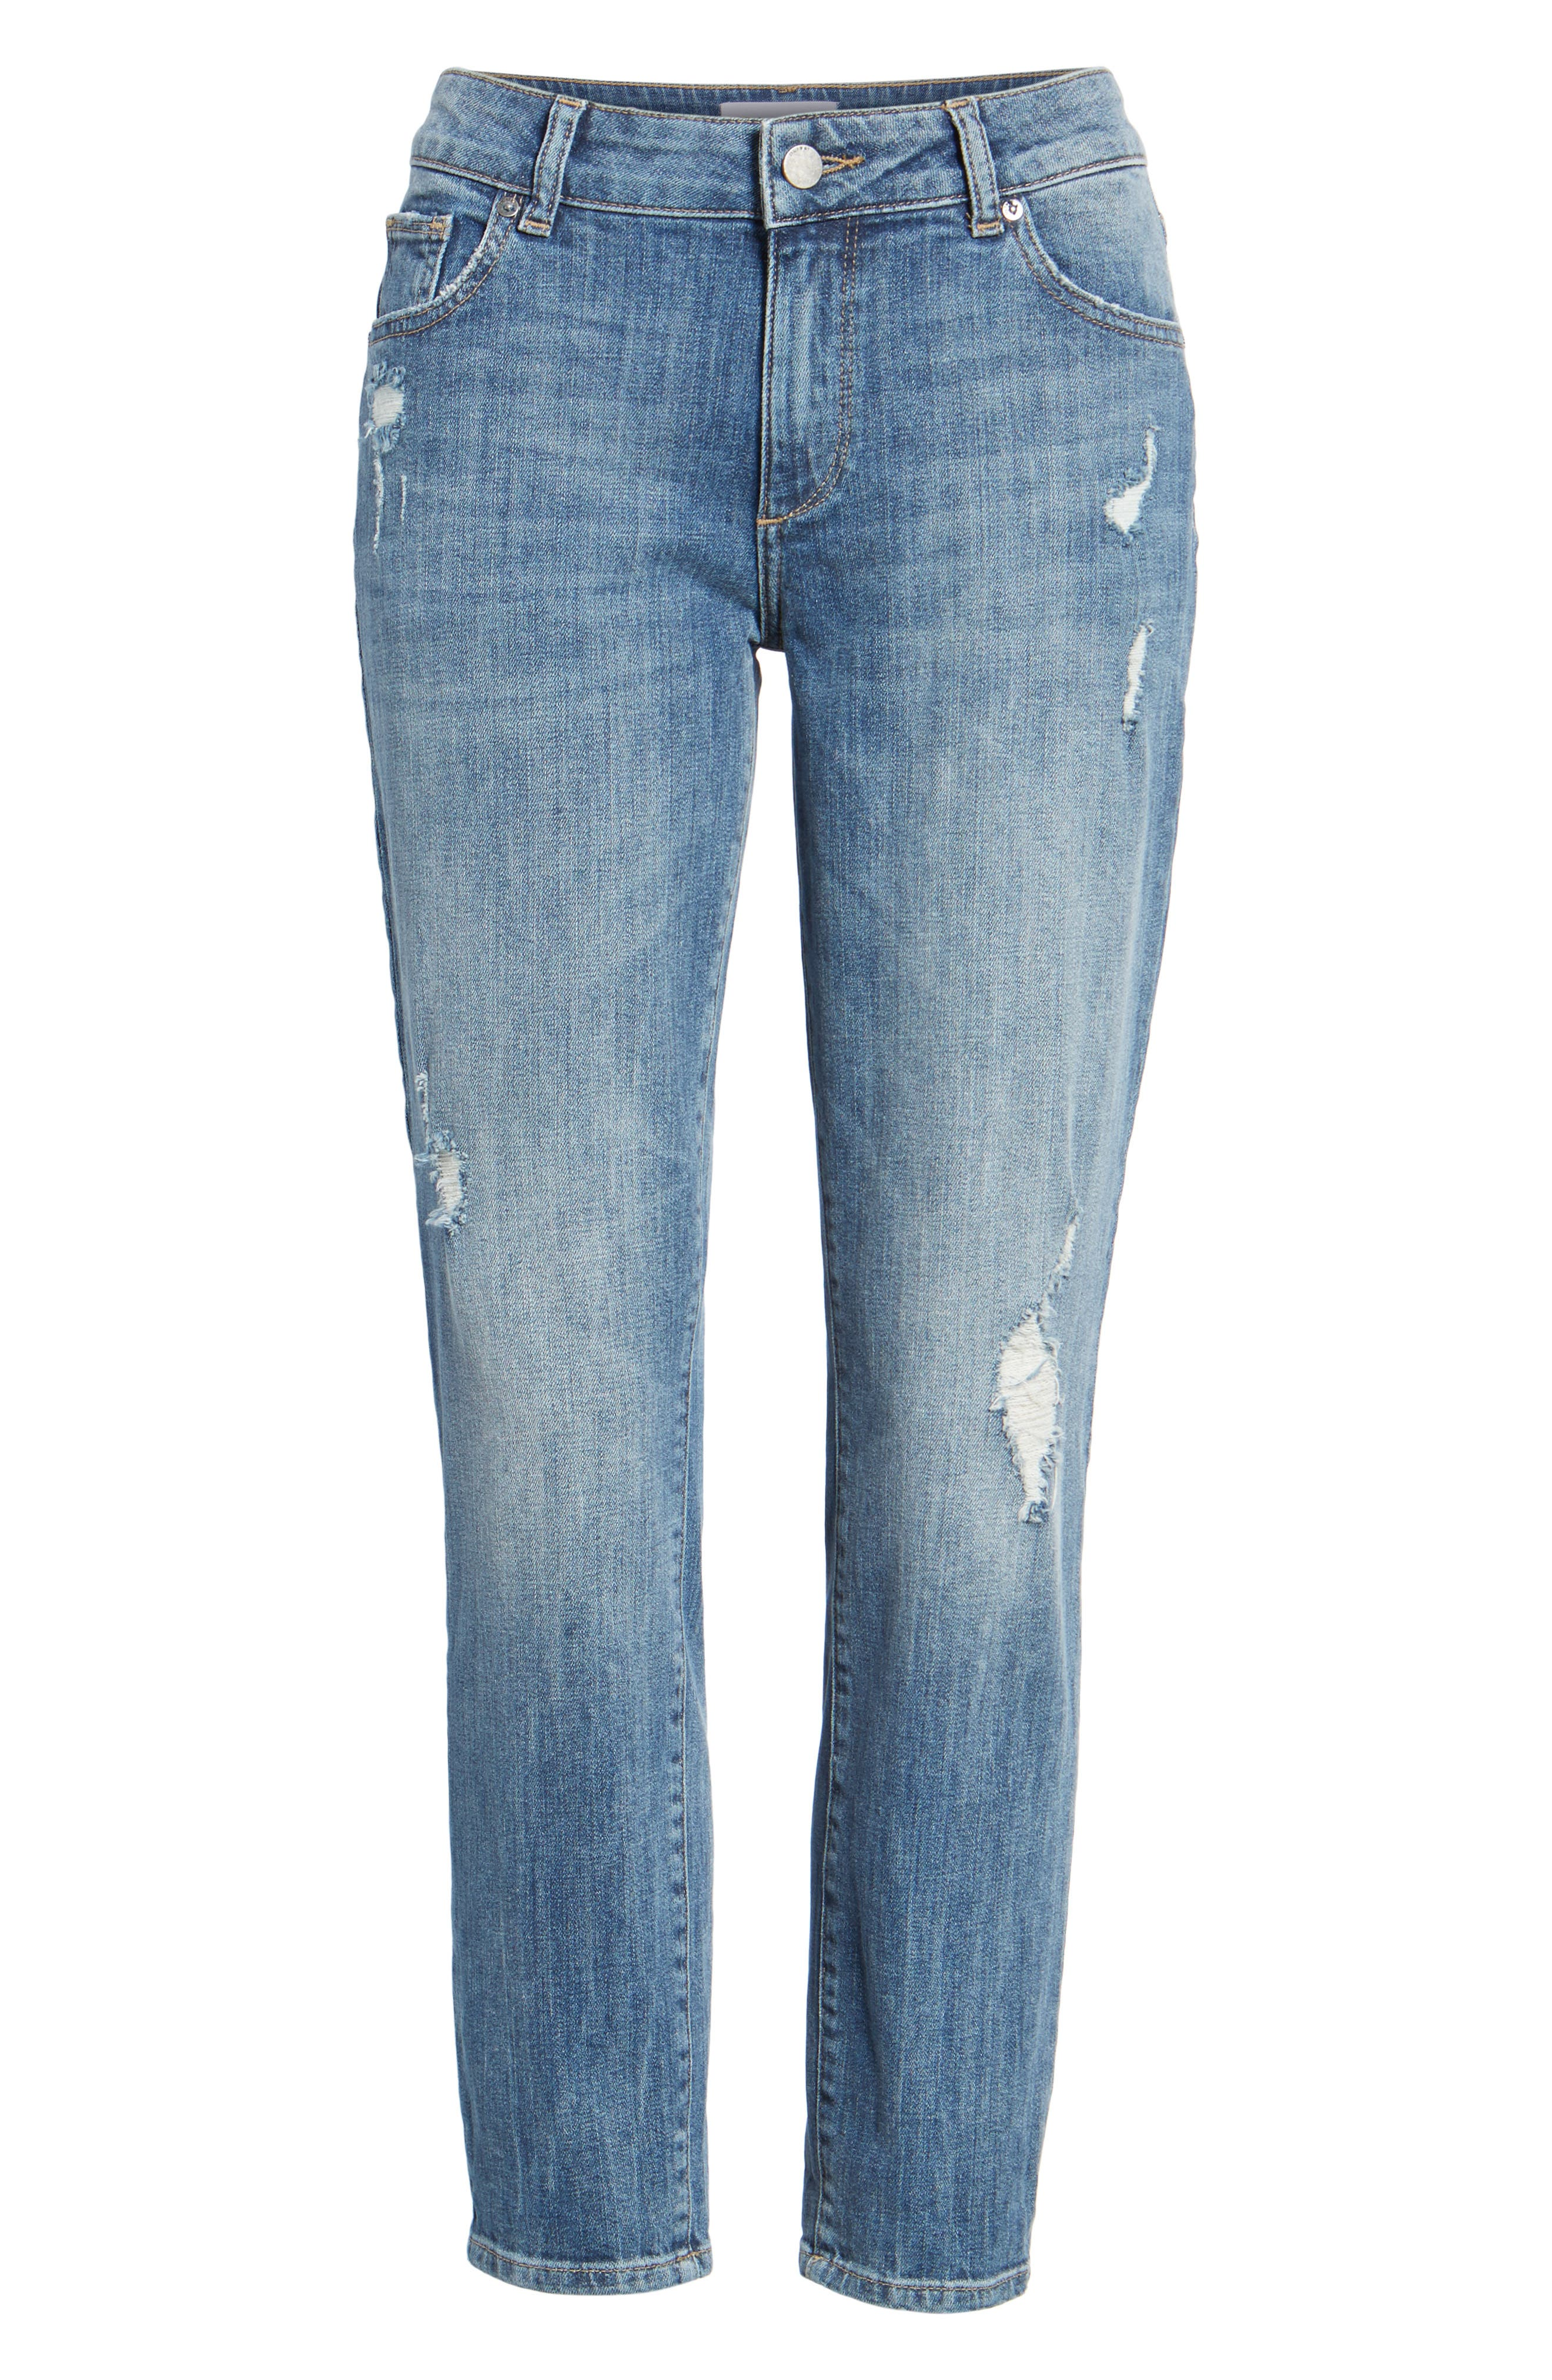 Davis Ankle Girlfriend Jeans,                             Alternate thumbnail 7, color,                             425